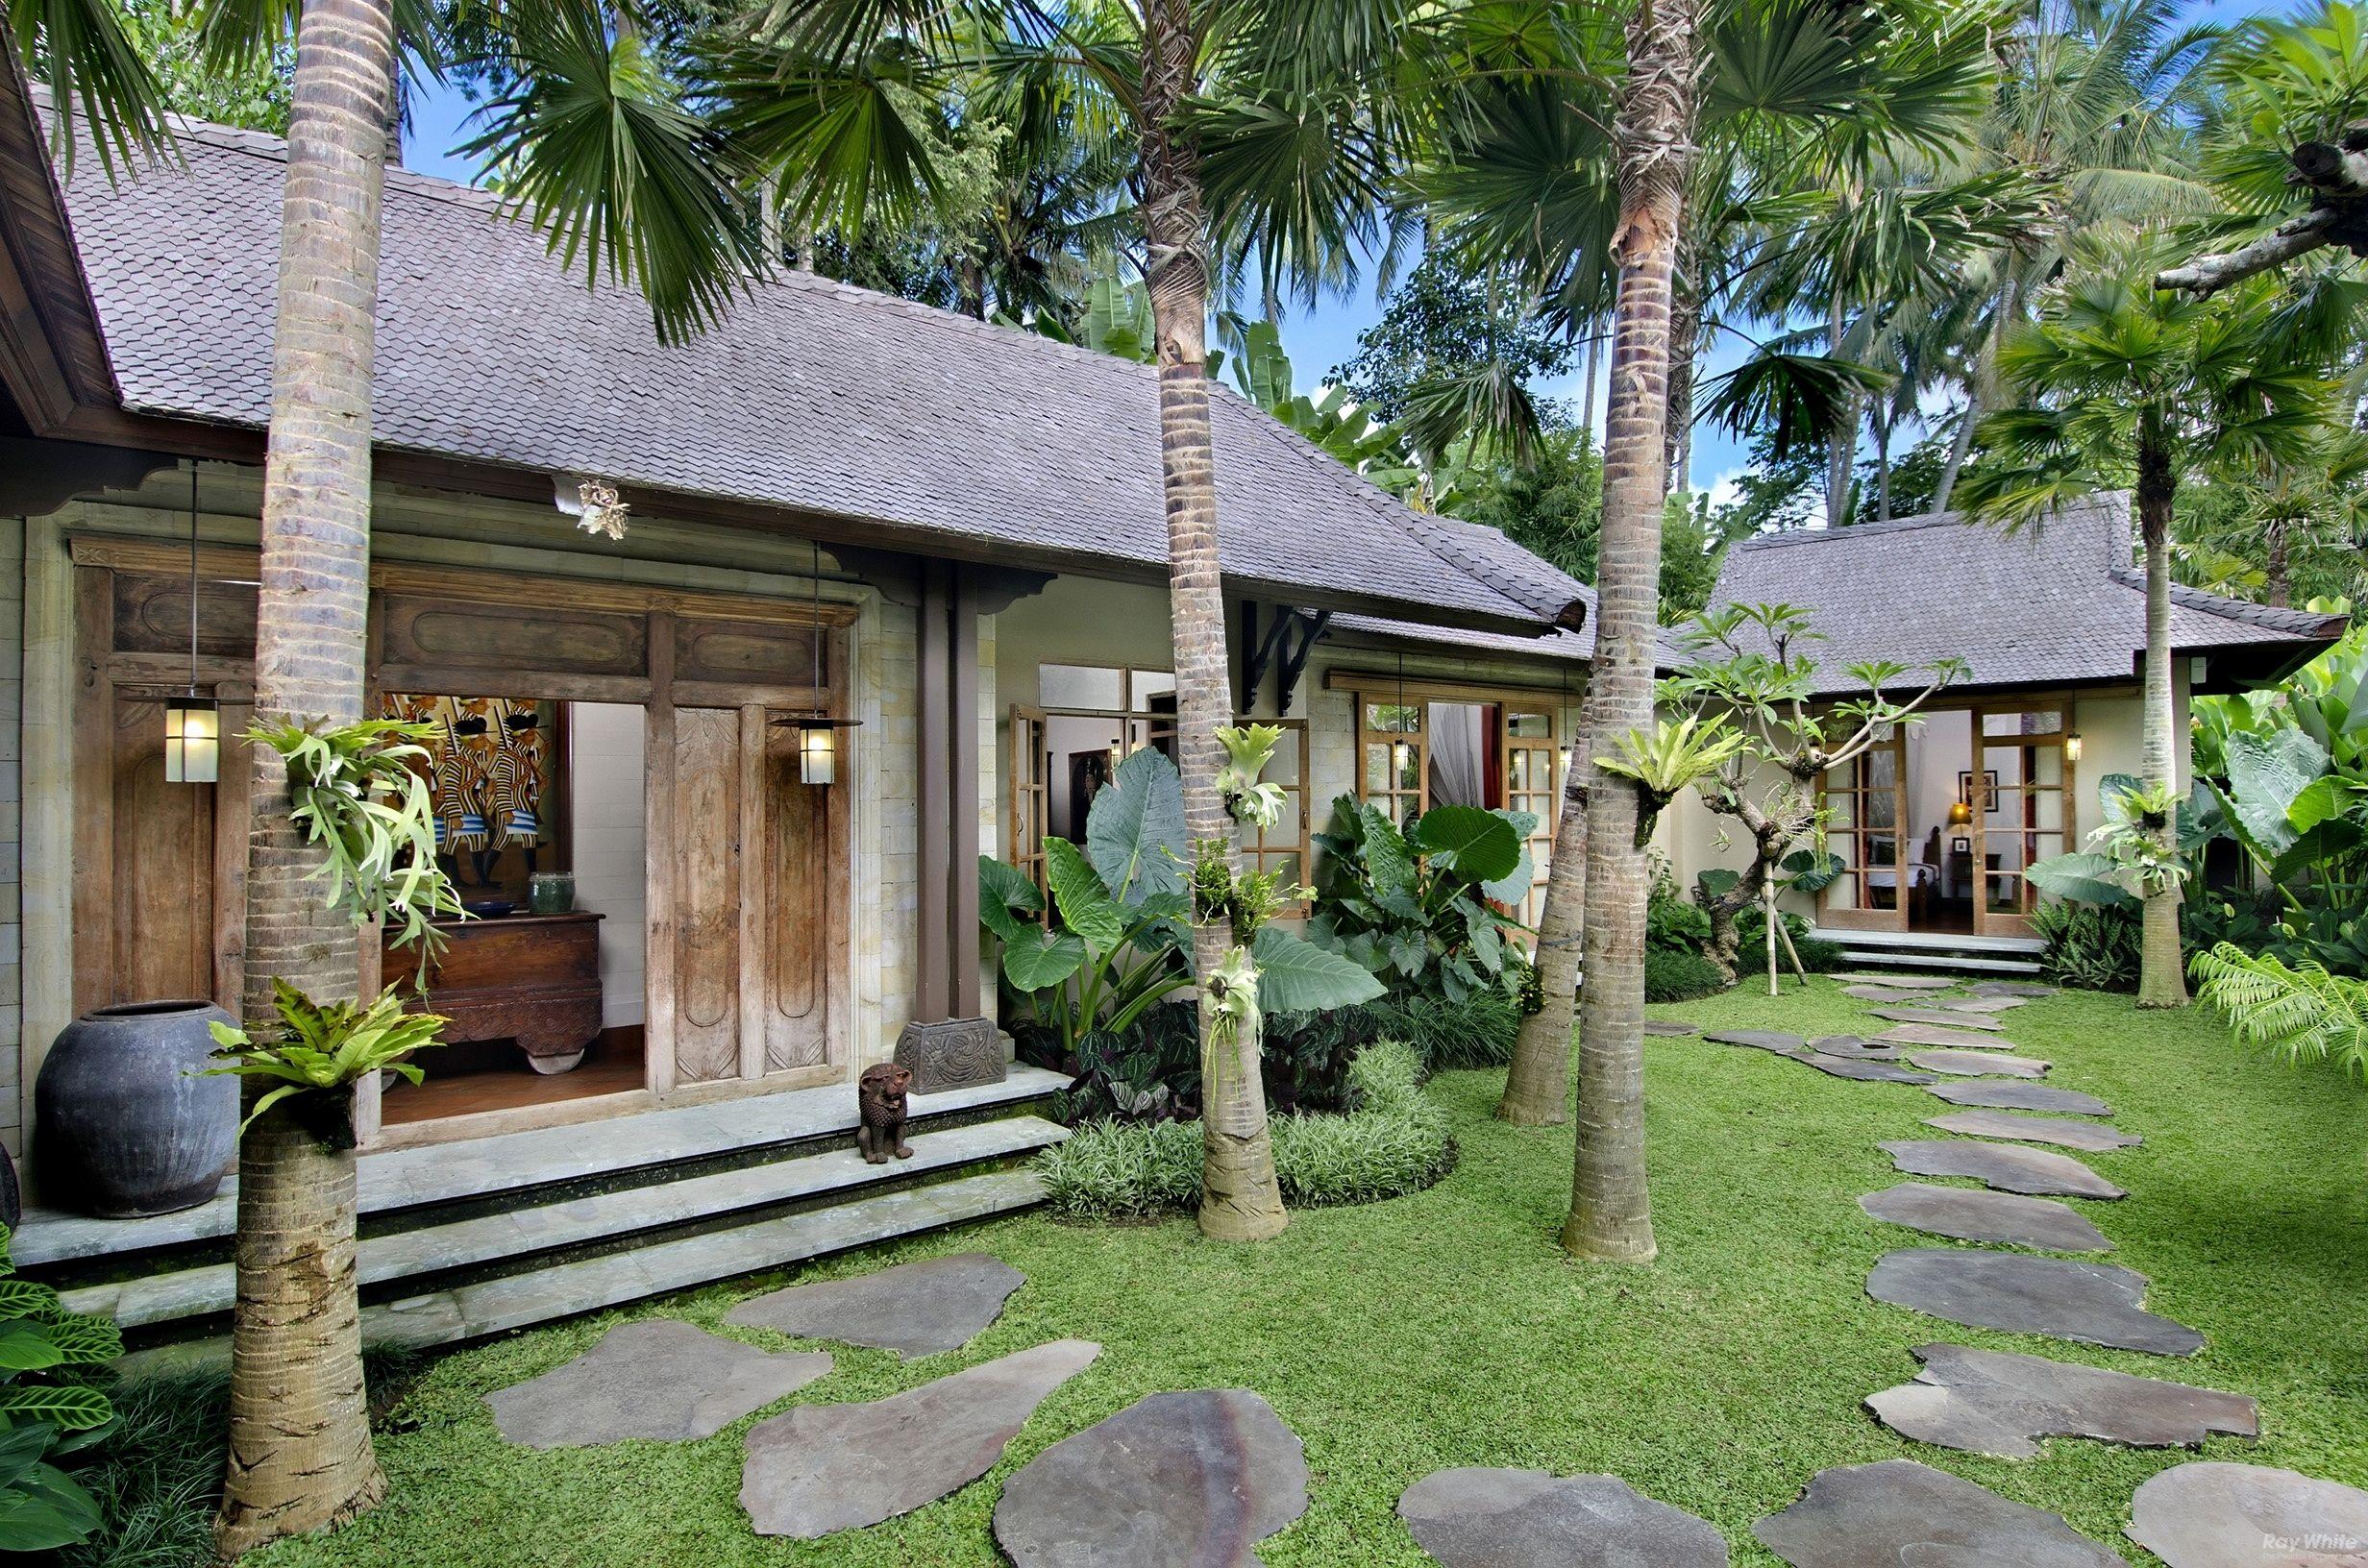 Bali Style Home Plans Elegant Bali Style Villa House Plans Design Ideas With Image Minimalist Tropical House Design Bali Style Home Balinese Garden